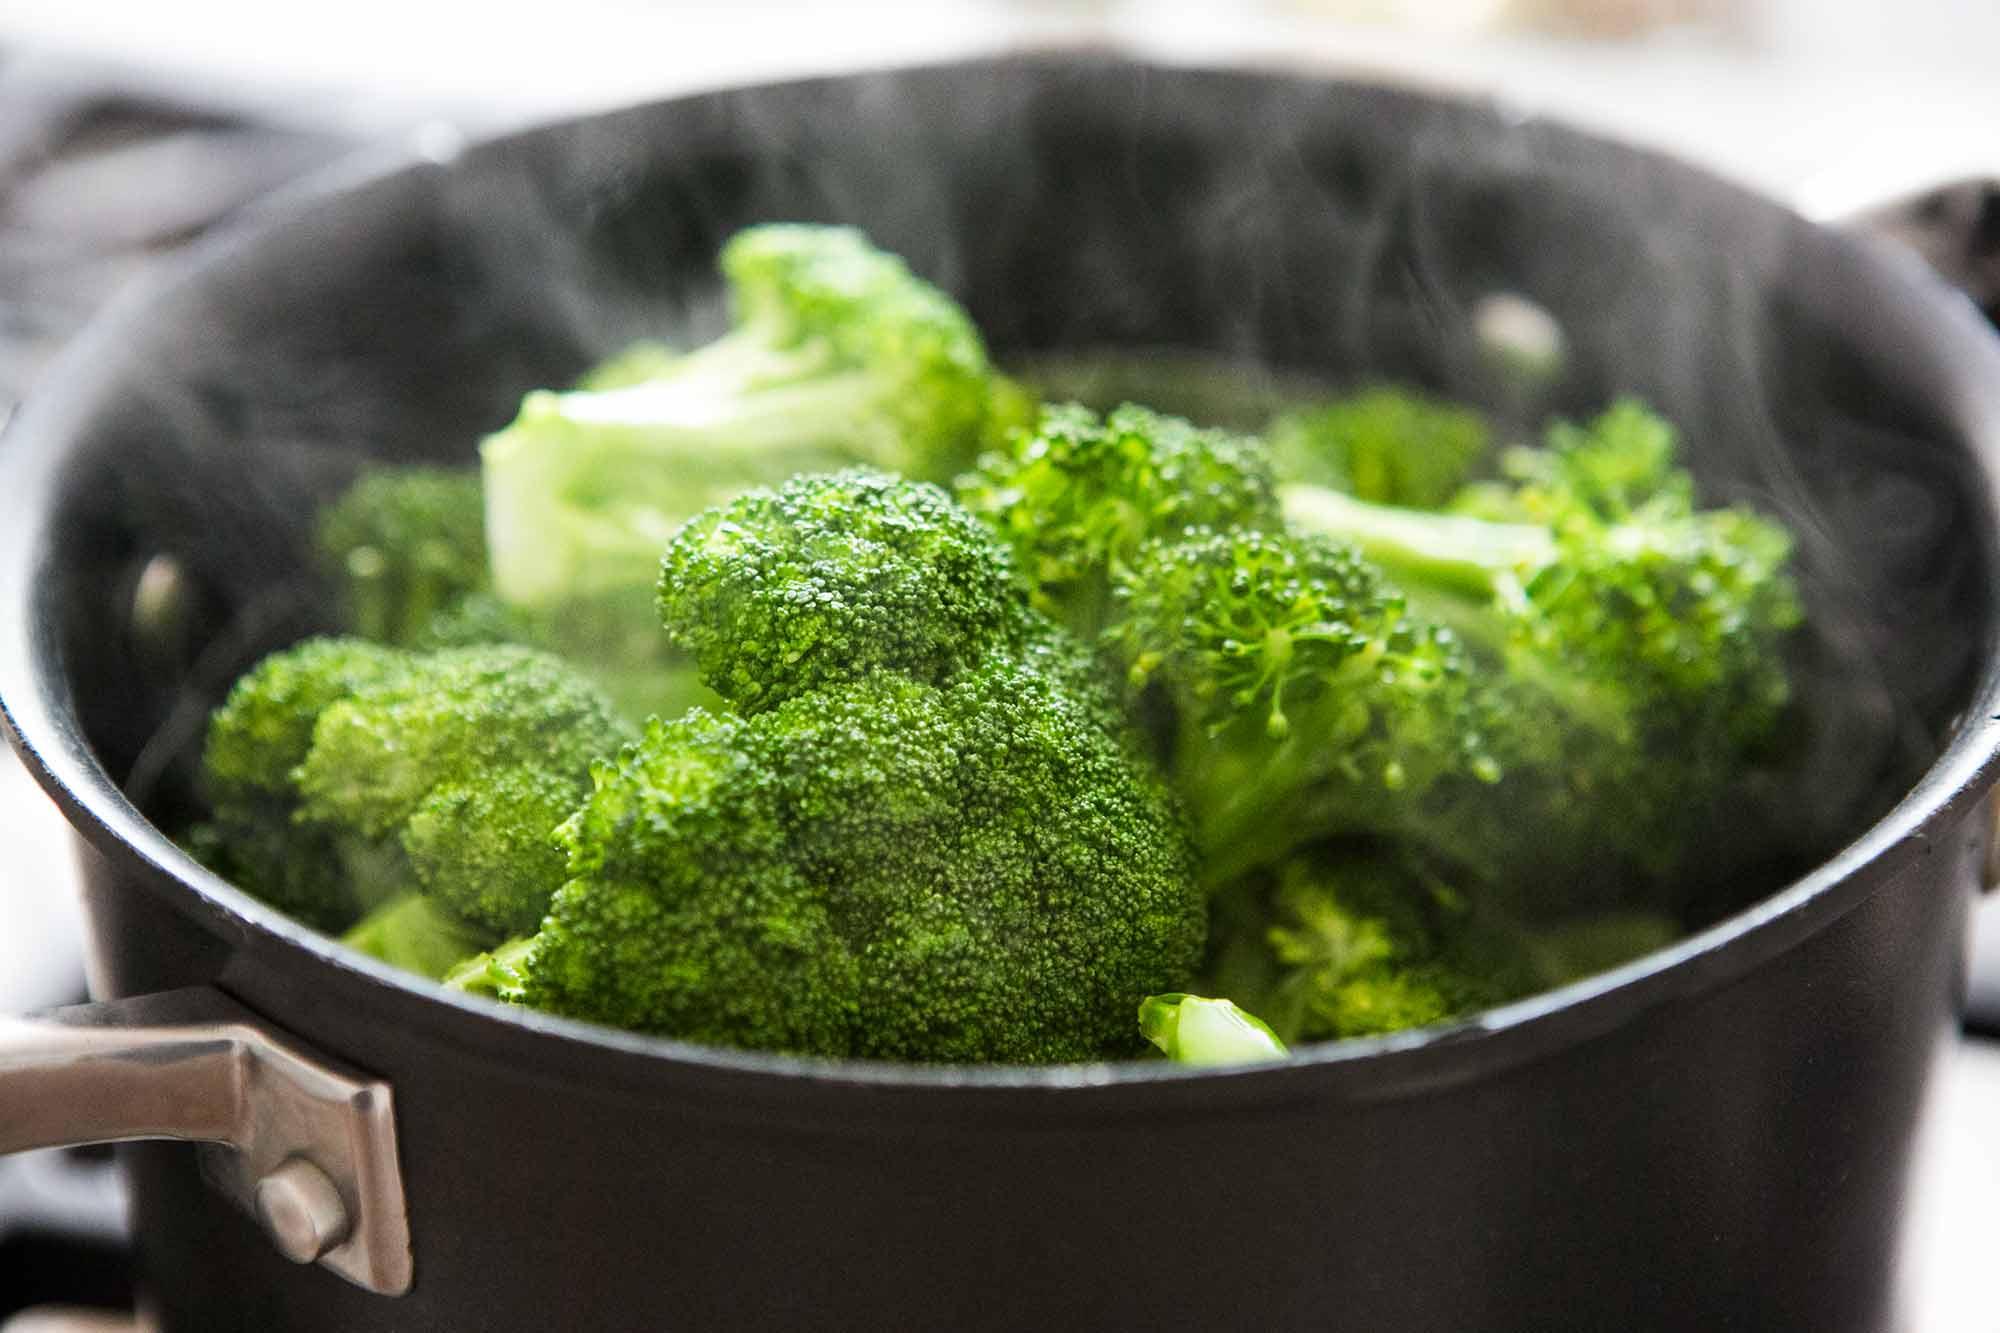 raw vegetables broccoli celery